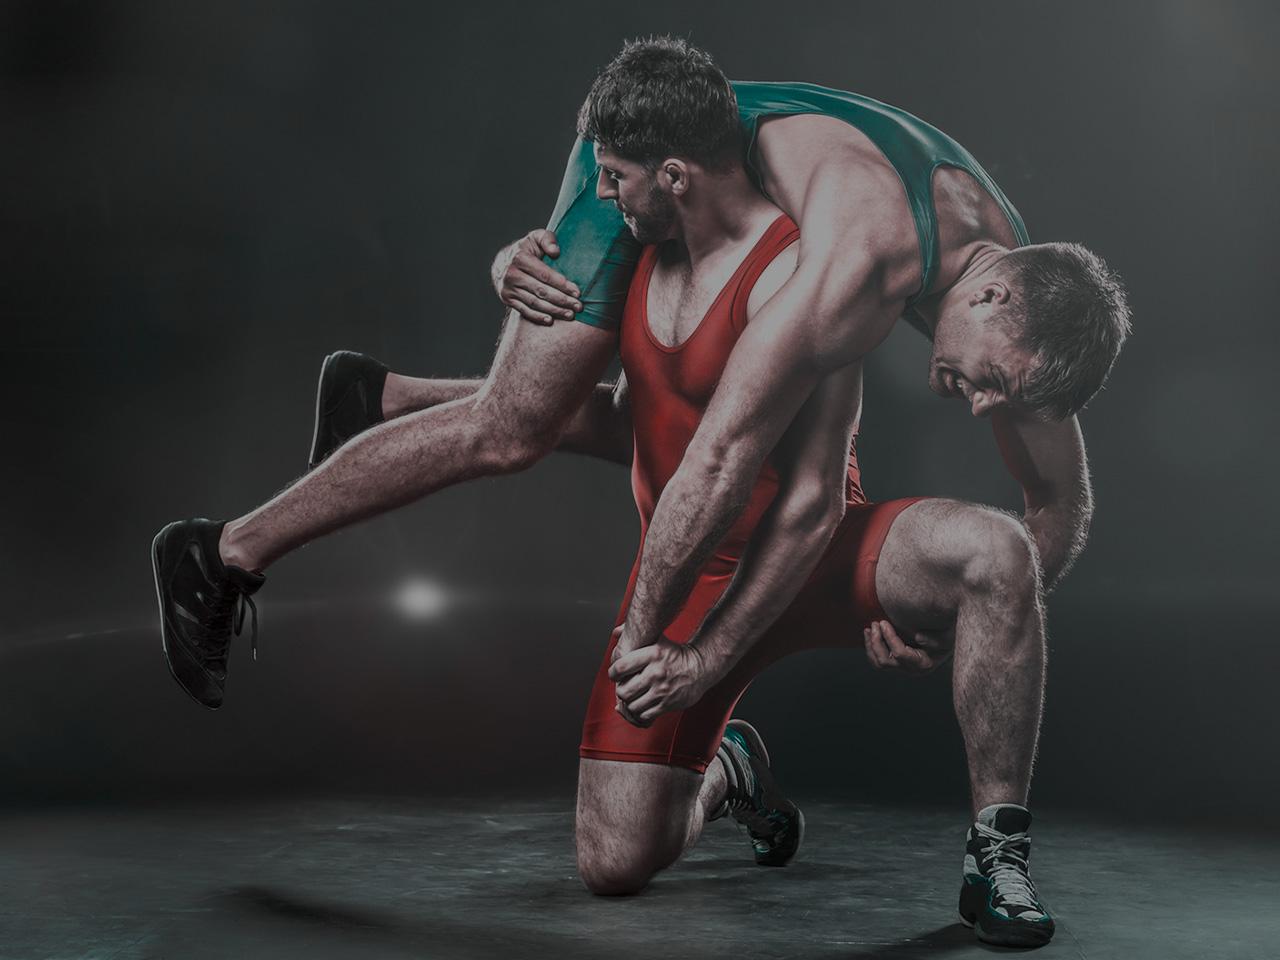 характеристике крутые картинки спорт борьба возникает при снижении